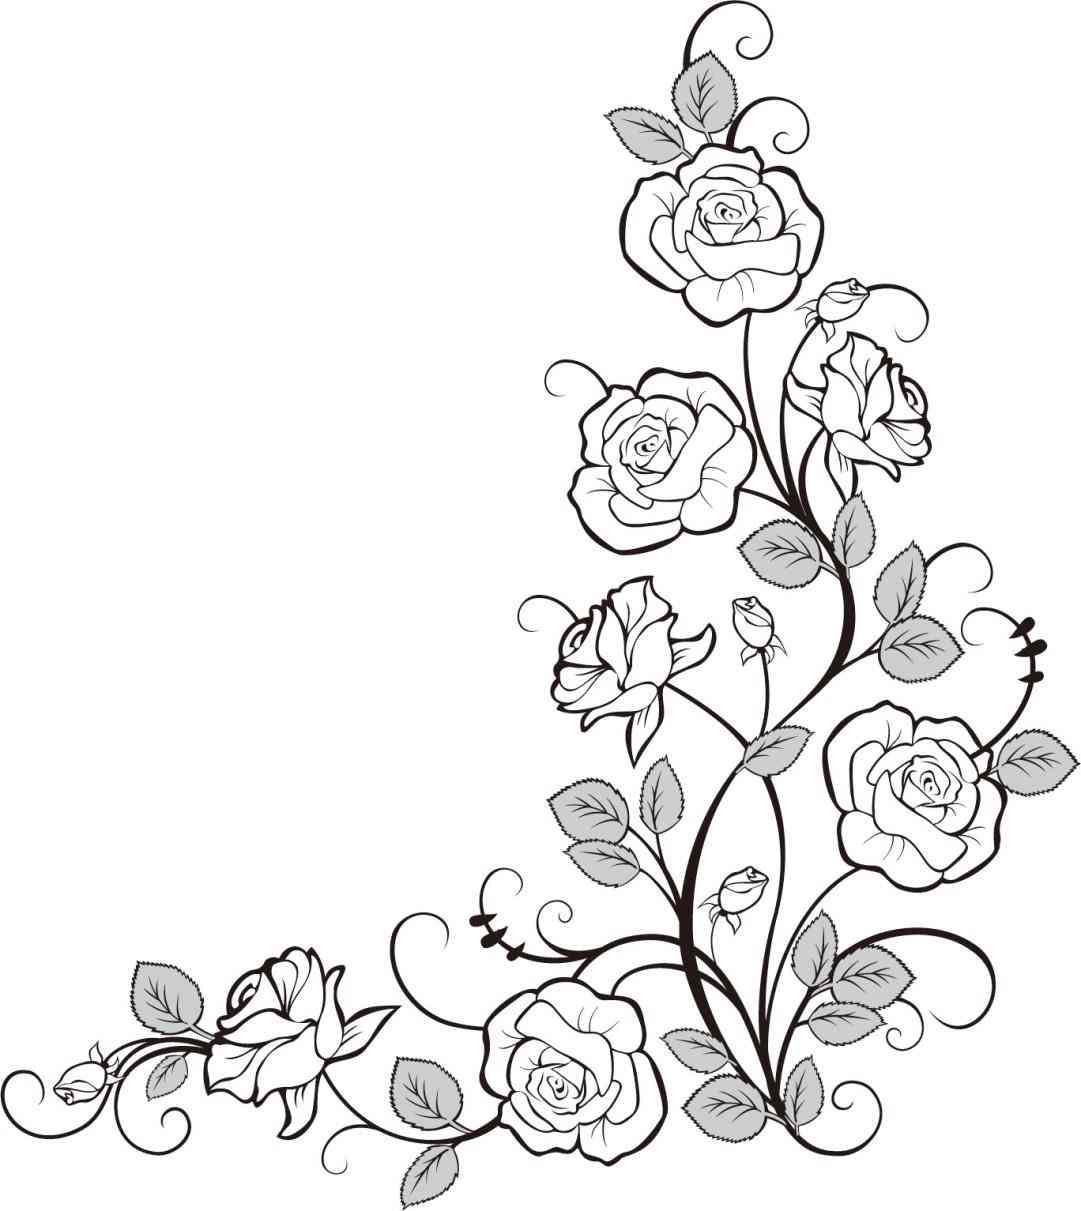 1081x1211 And Vine Icon Transparent Background Klejonka Vine Rose Vine